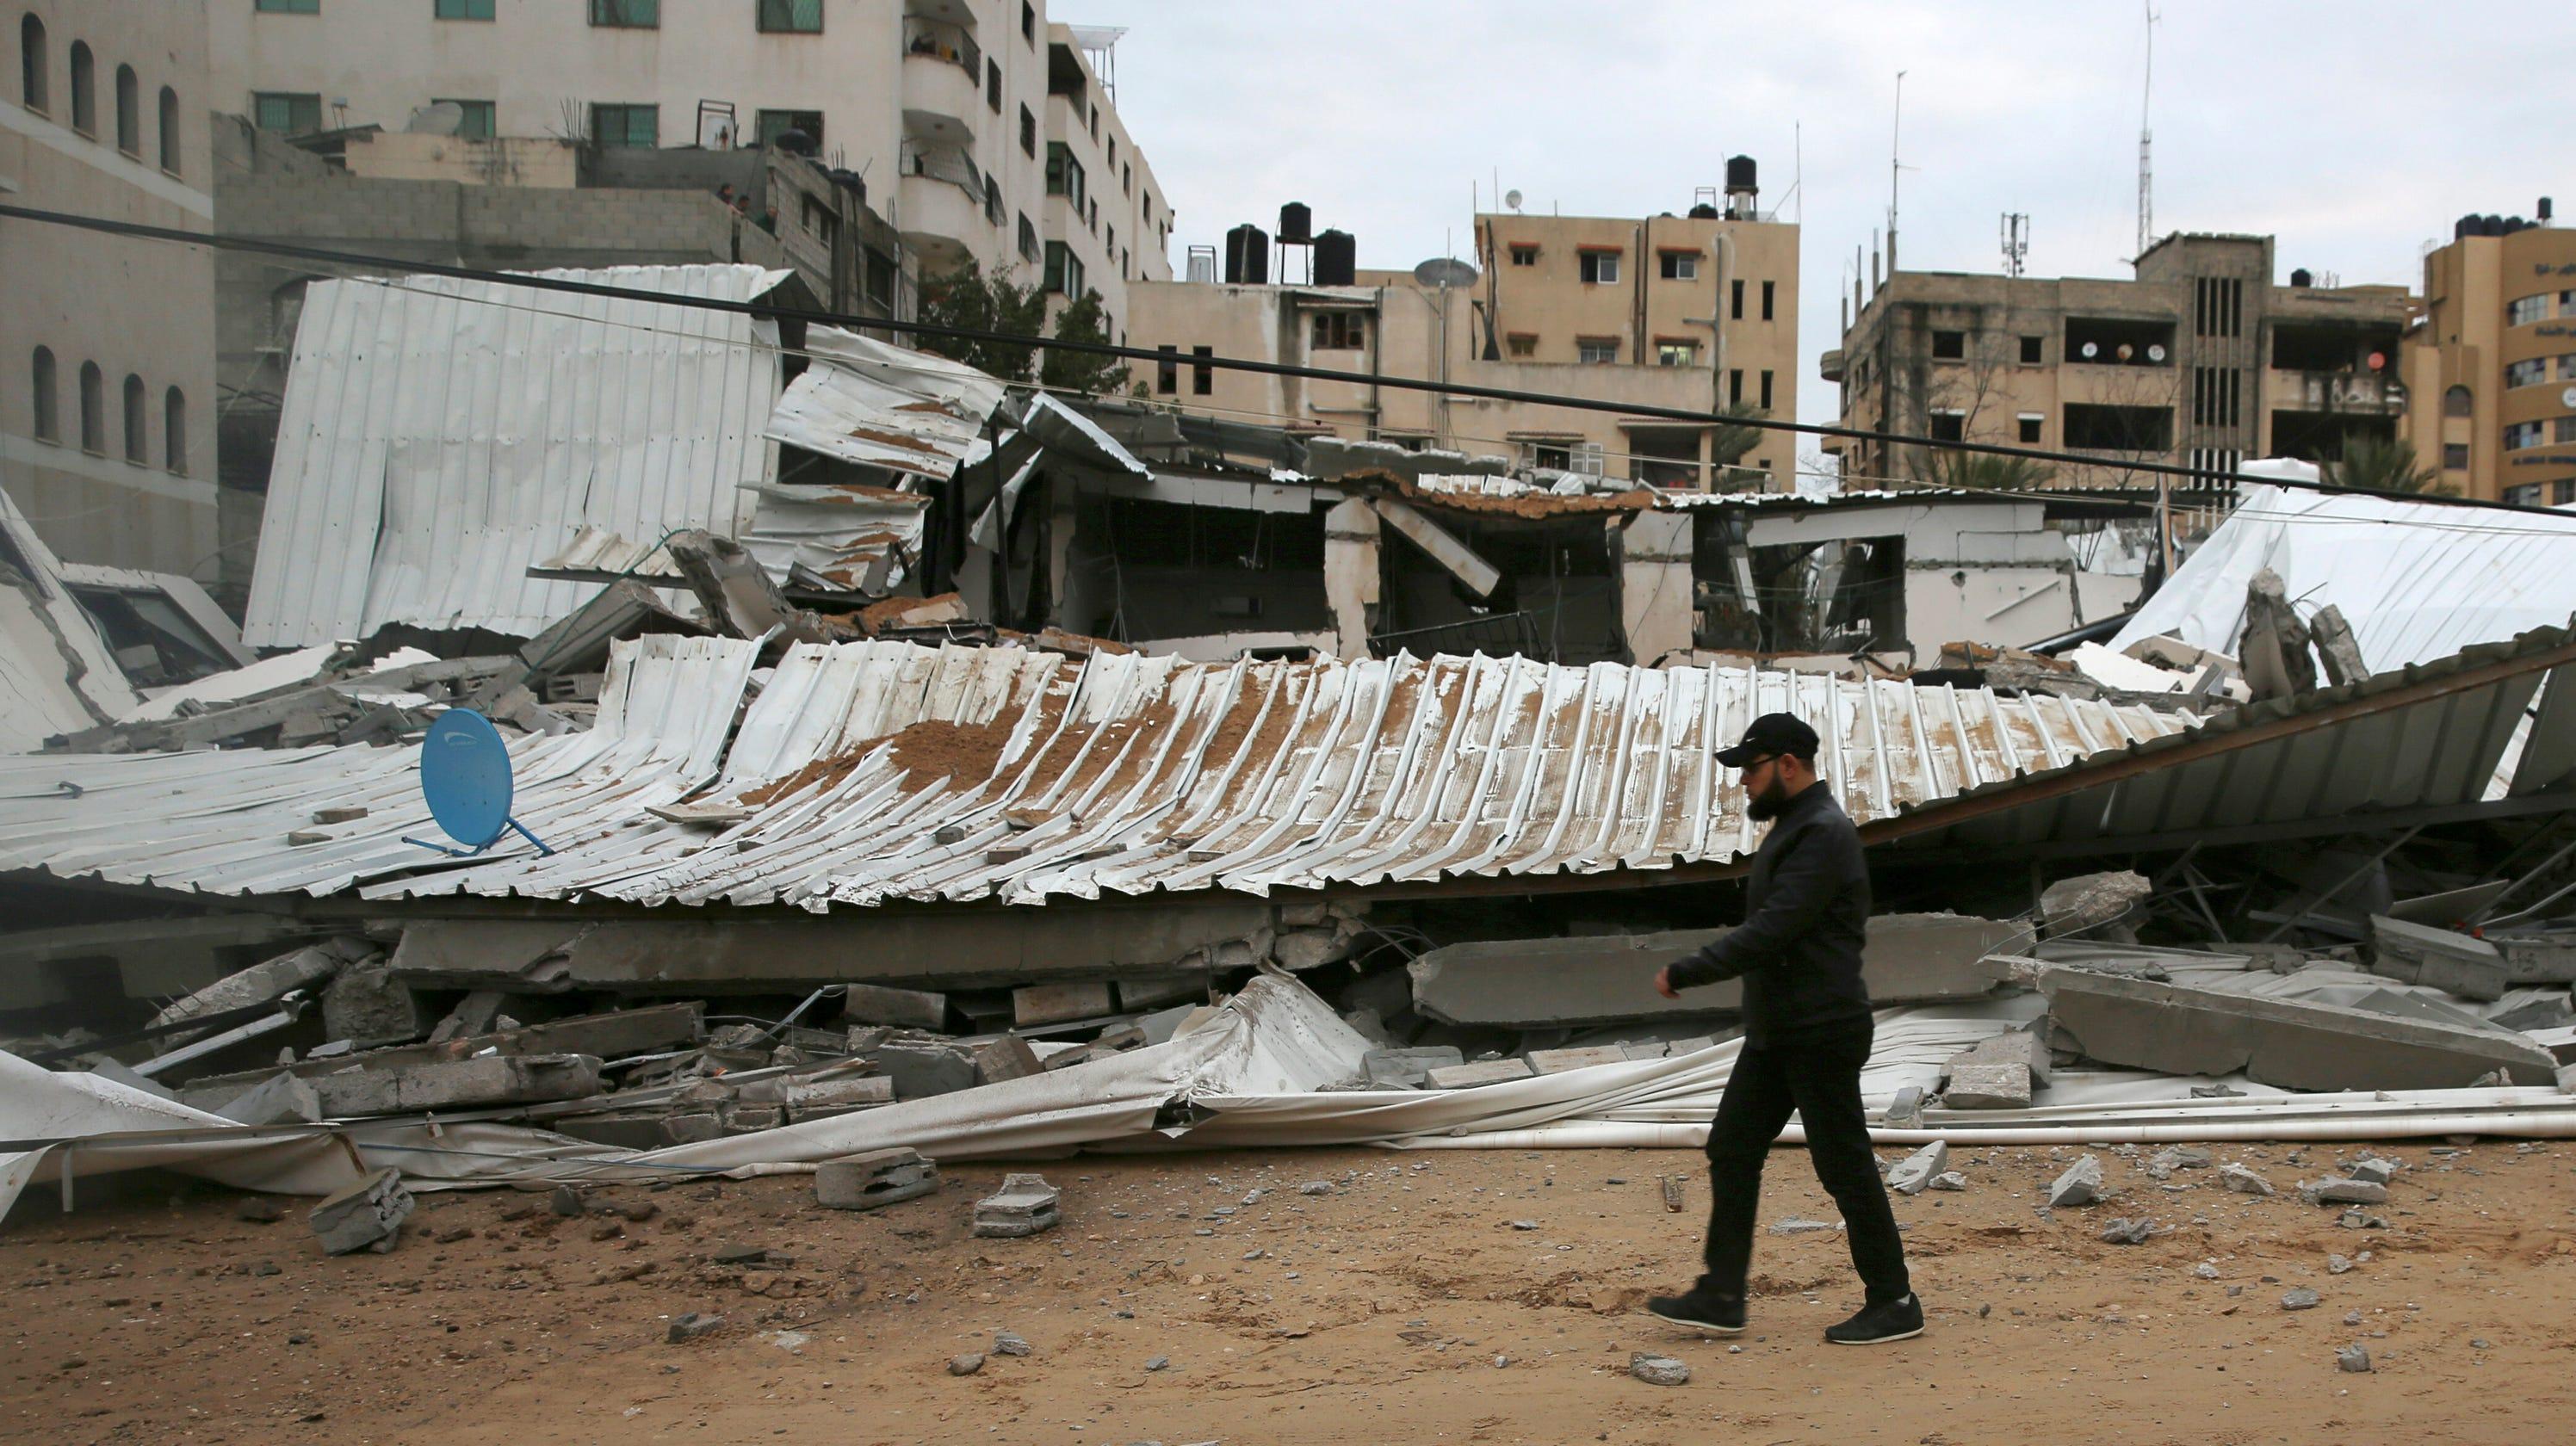 Three rockets fired from Gaza, newborn hurt in rush to shelter